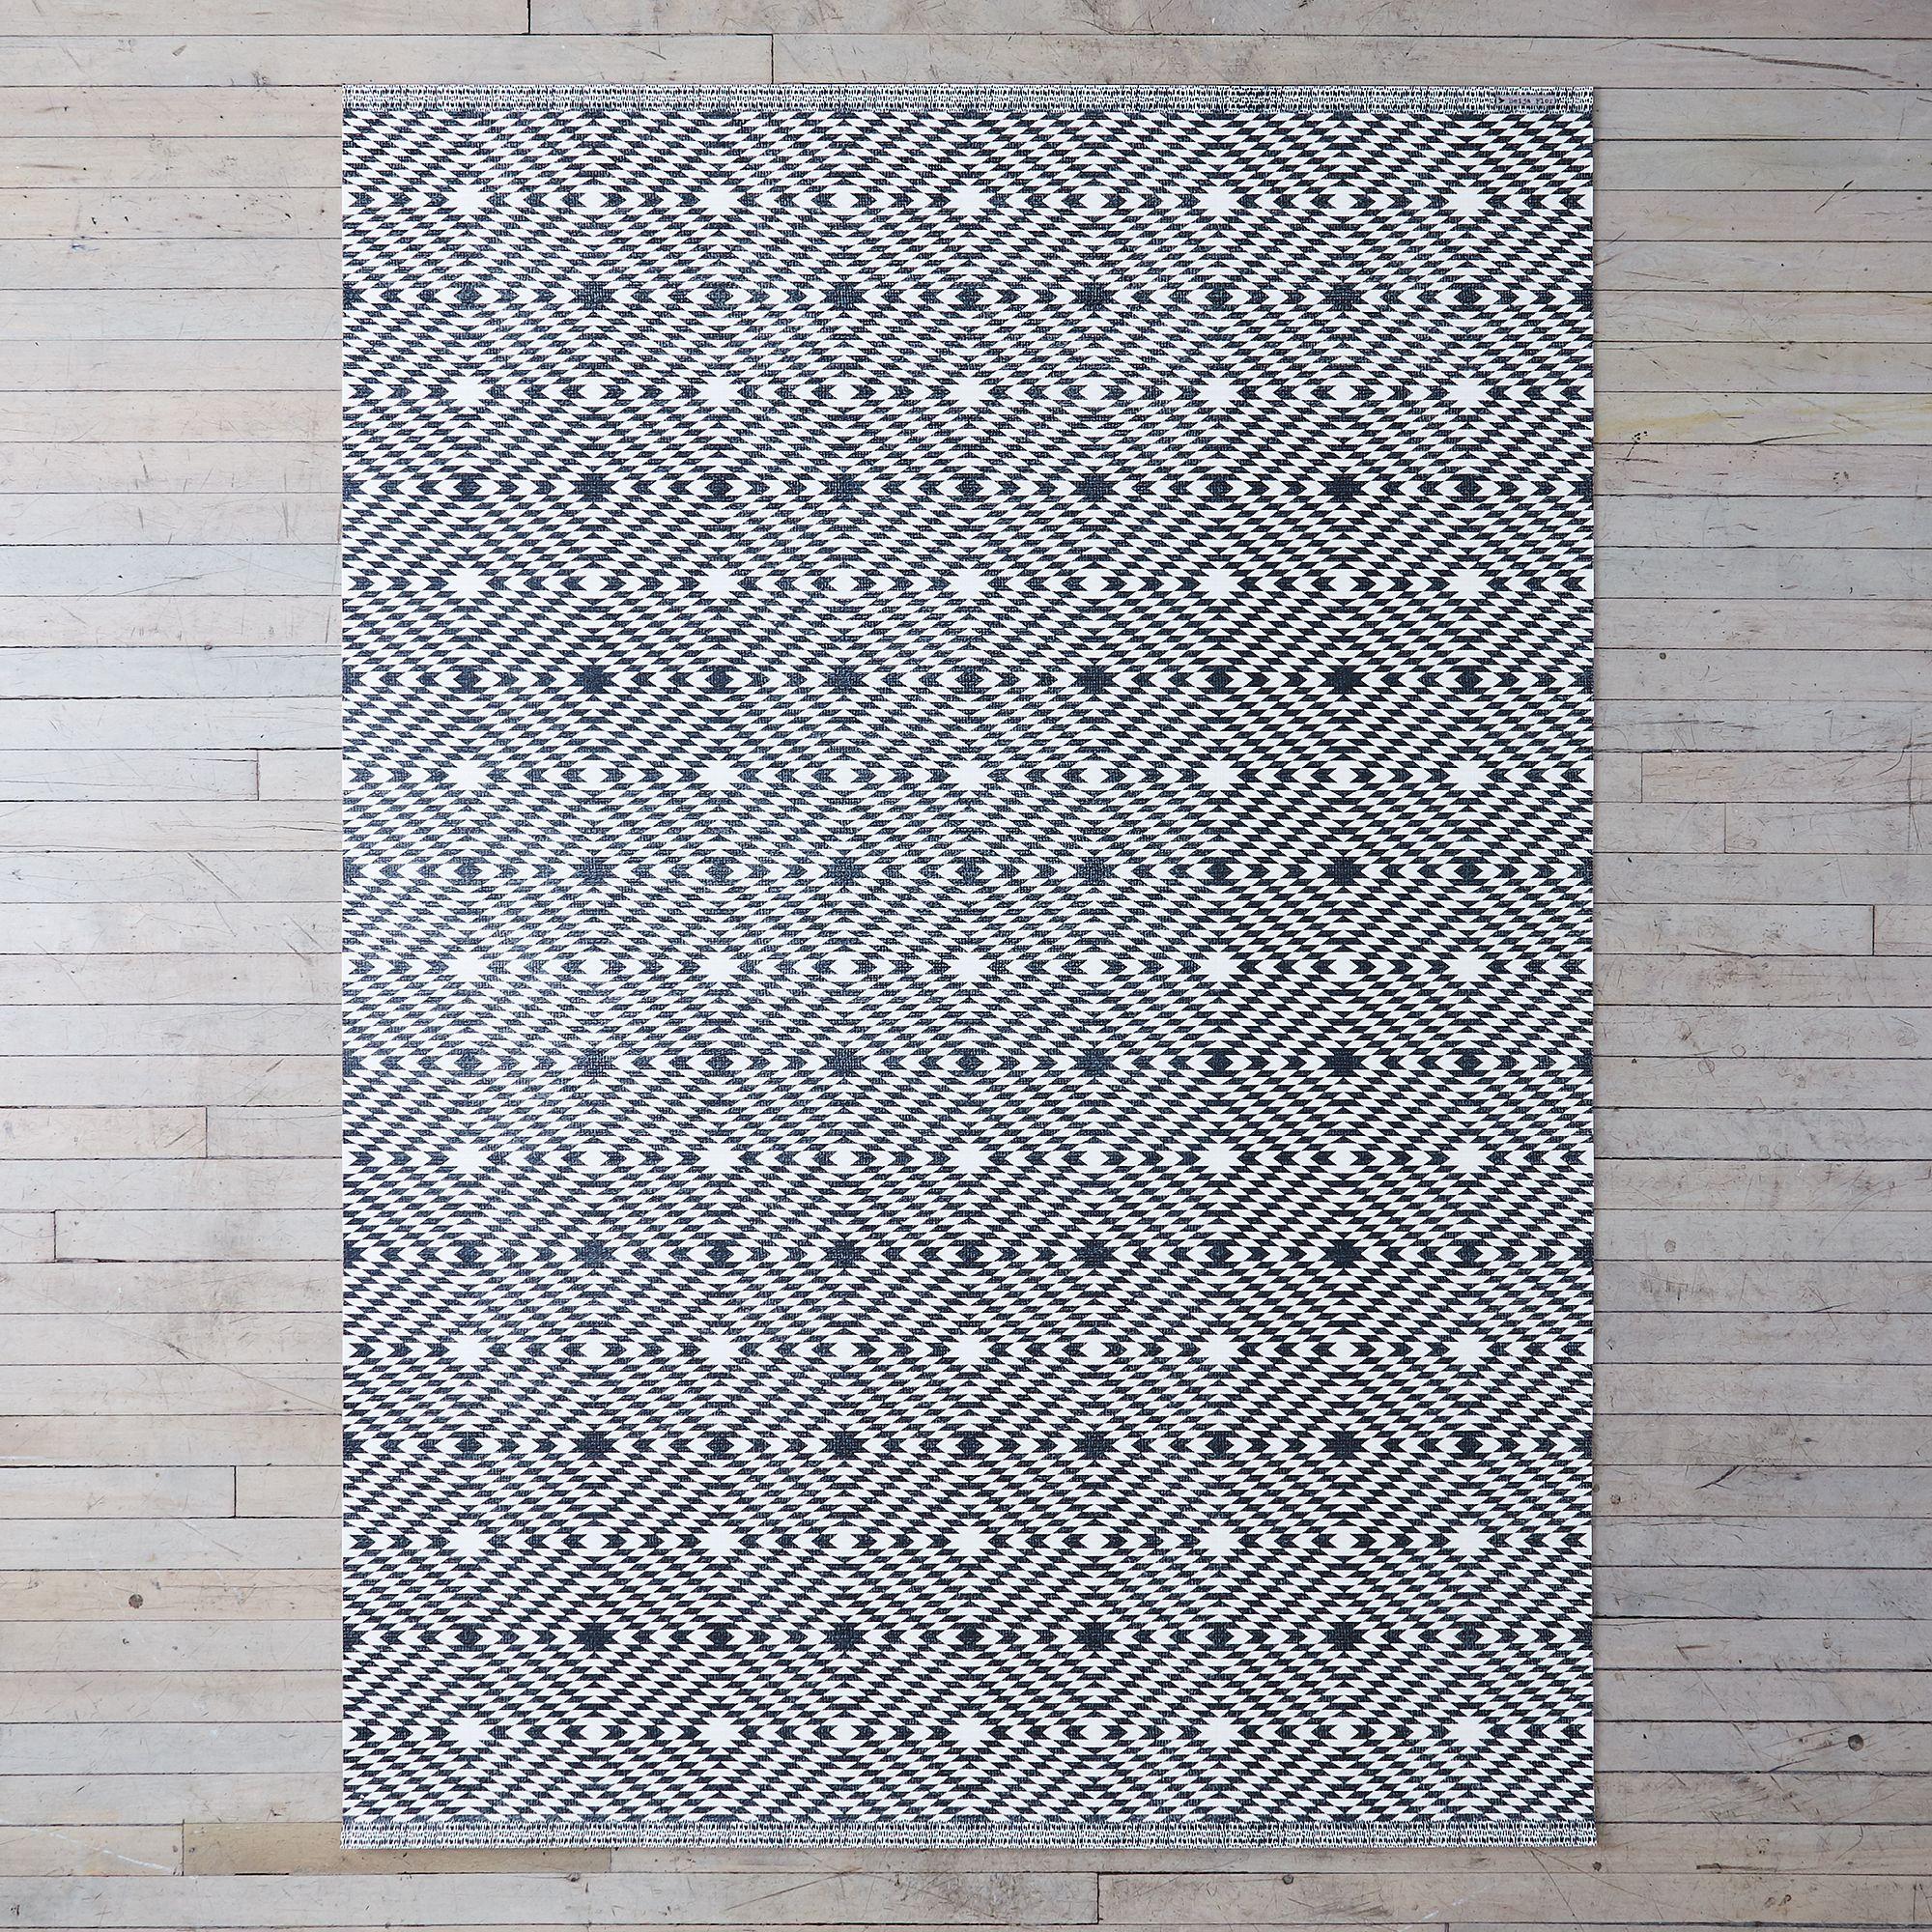 835dfbcd 7520 489c a53d 64008e896308  2017 0628 kiss that frog flatwoven vinyl mat nordic textile black diamond 5 by 8 silo rocky luten 004